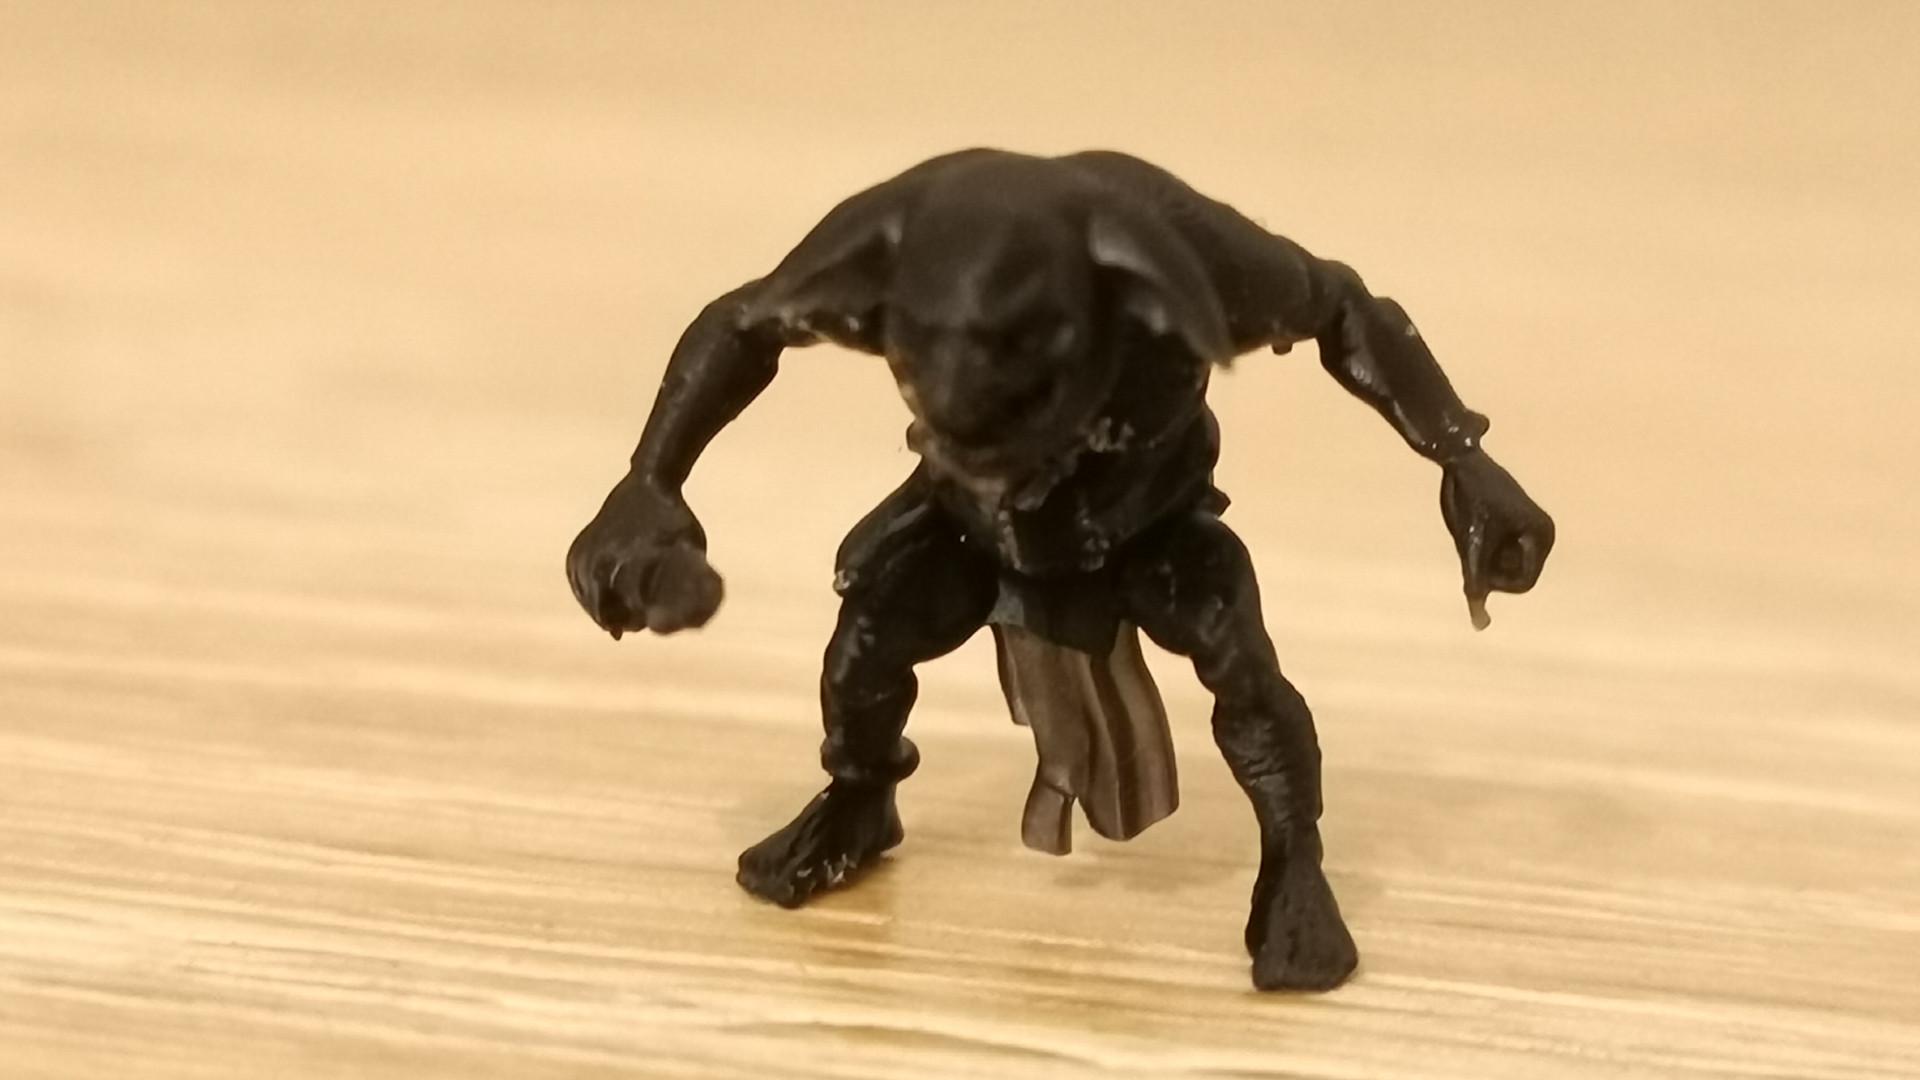 A tiny printed goblin figurine from the Elegoo Saturn